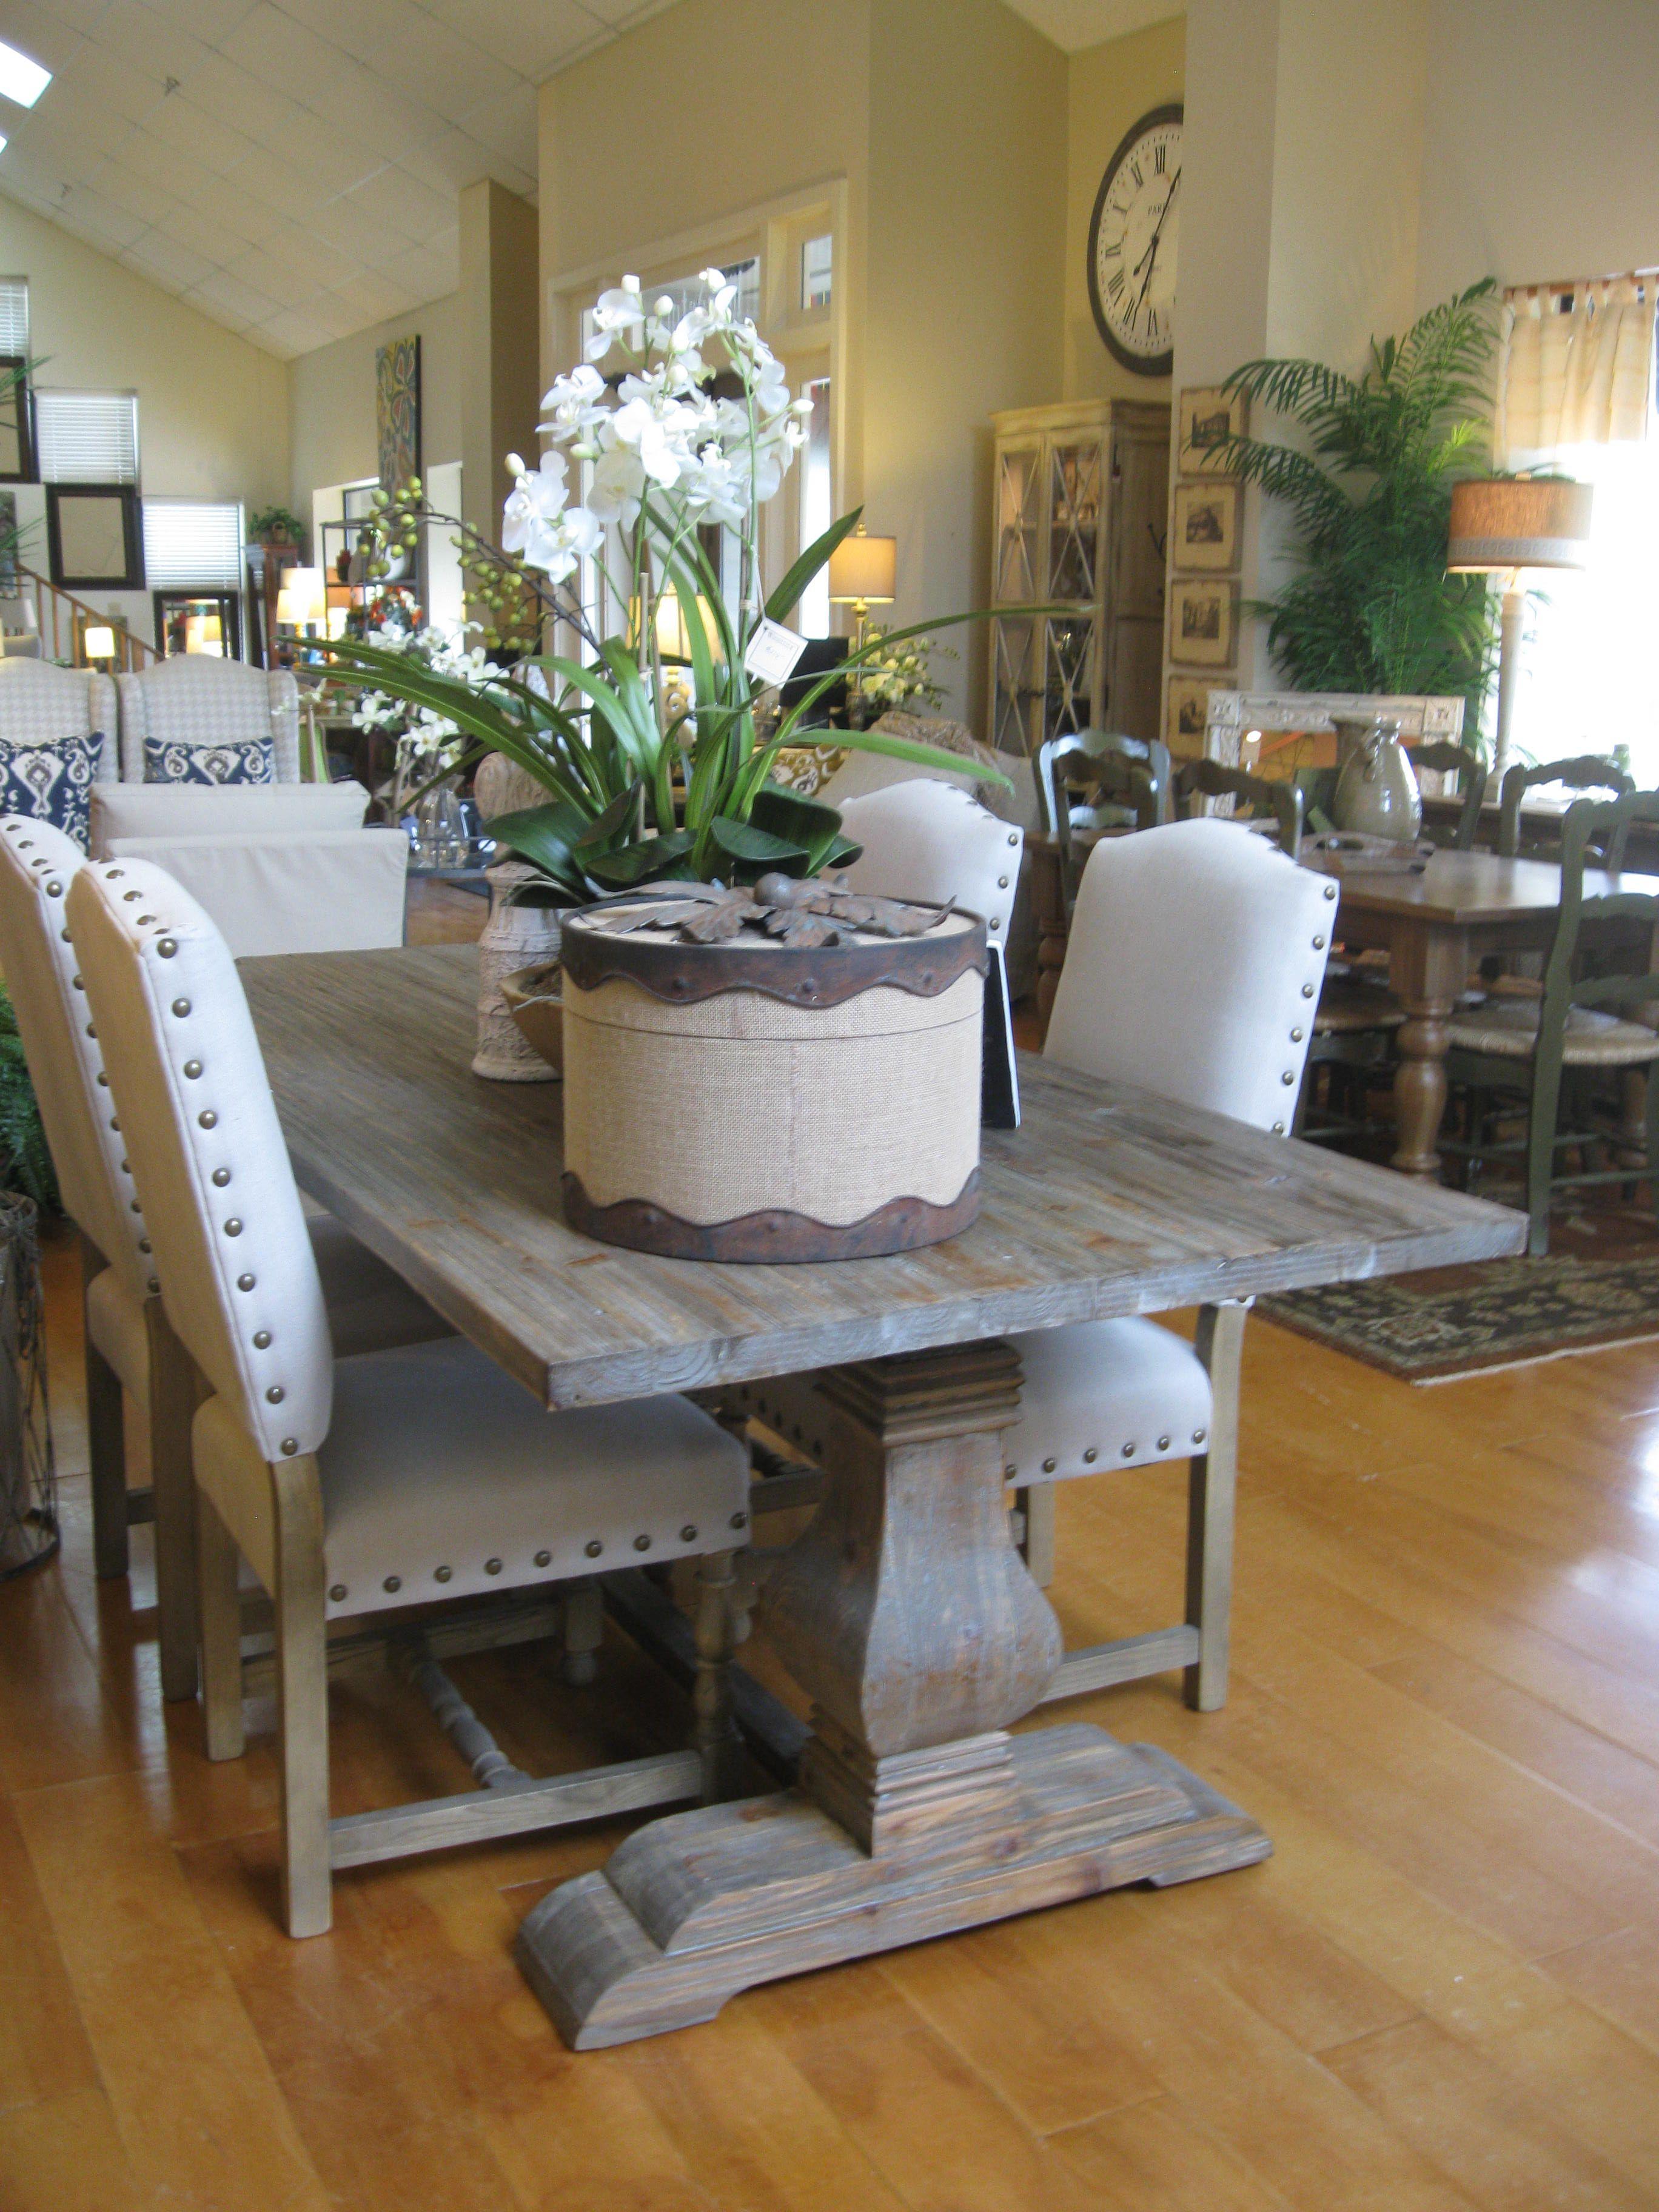 The Trestle Table Farmhouse Dining Rooms Decor Farmhouse Dining Room Farmhouse Dining Room Table